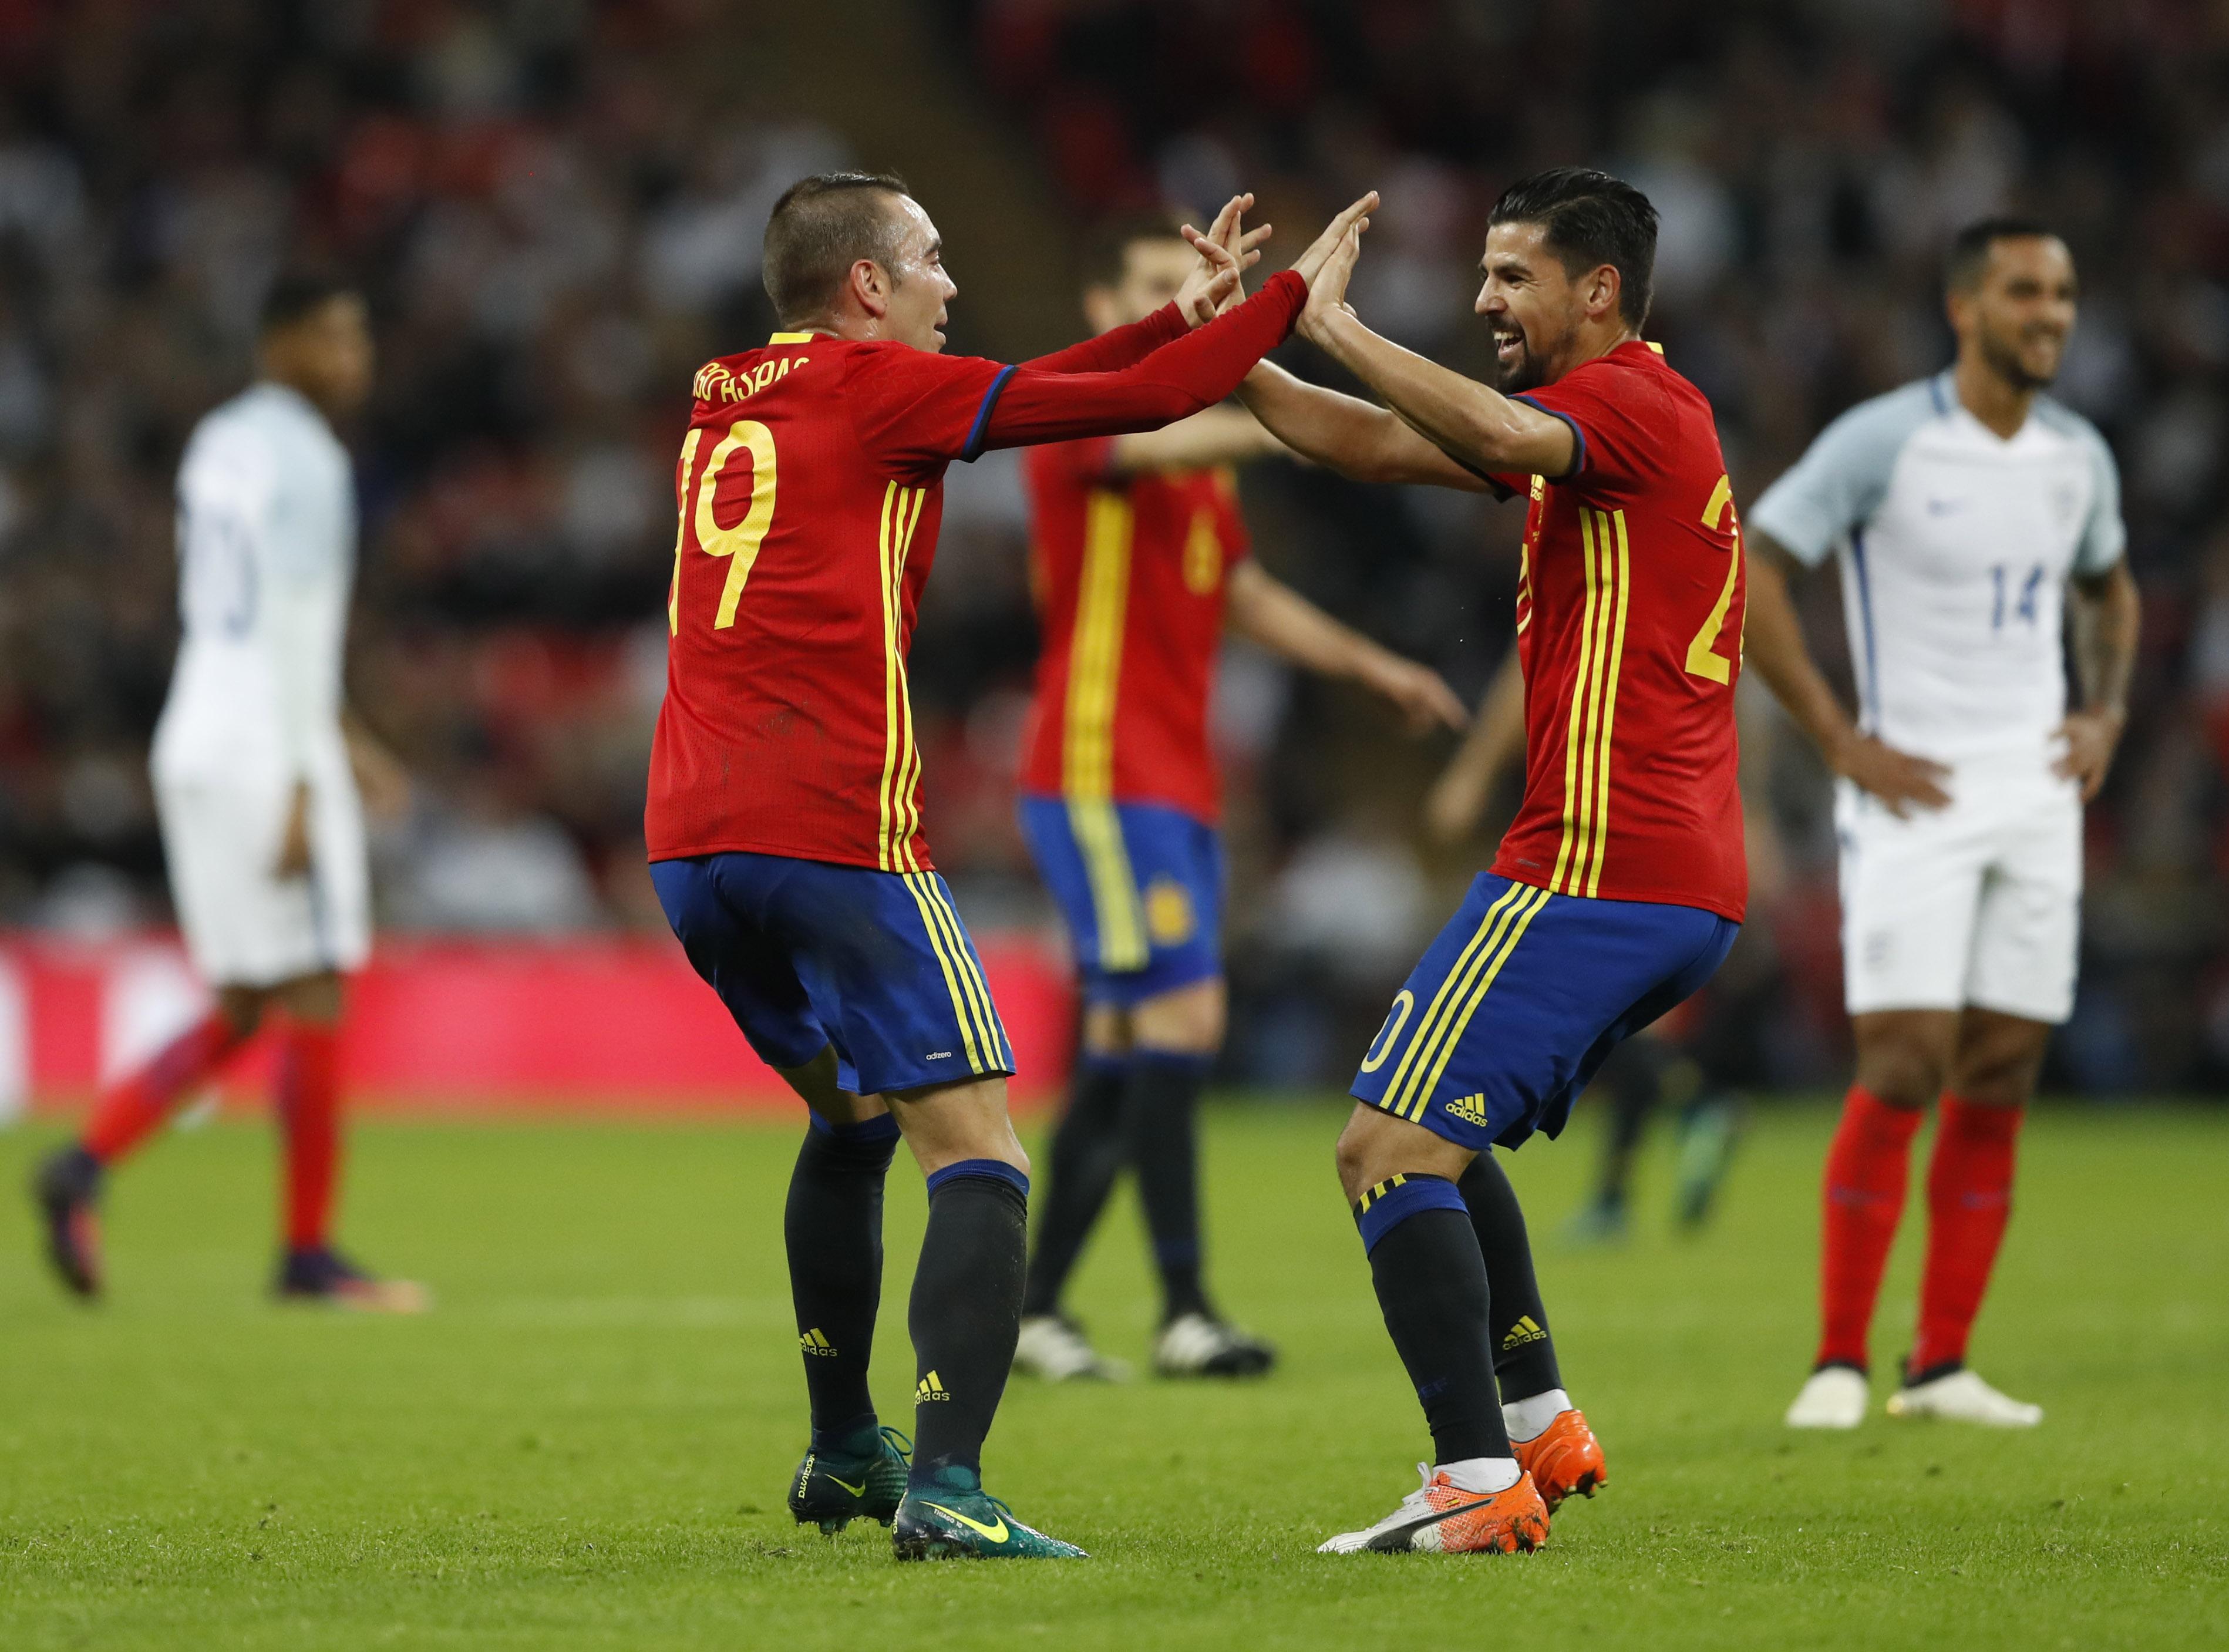 L Espagne Arrache Un Nul Inespere A Wembley Football